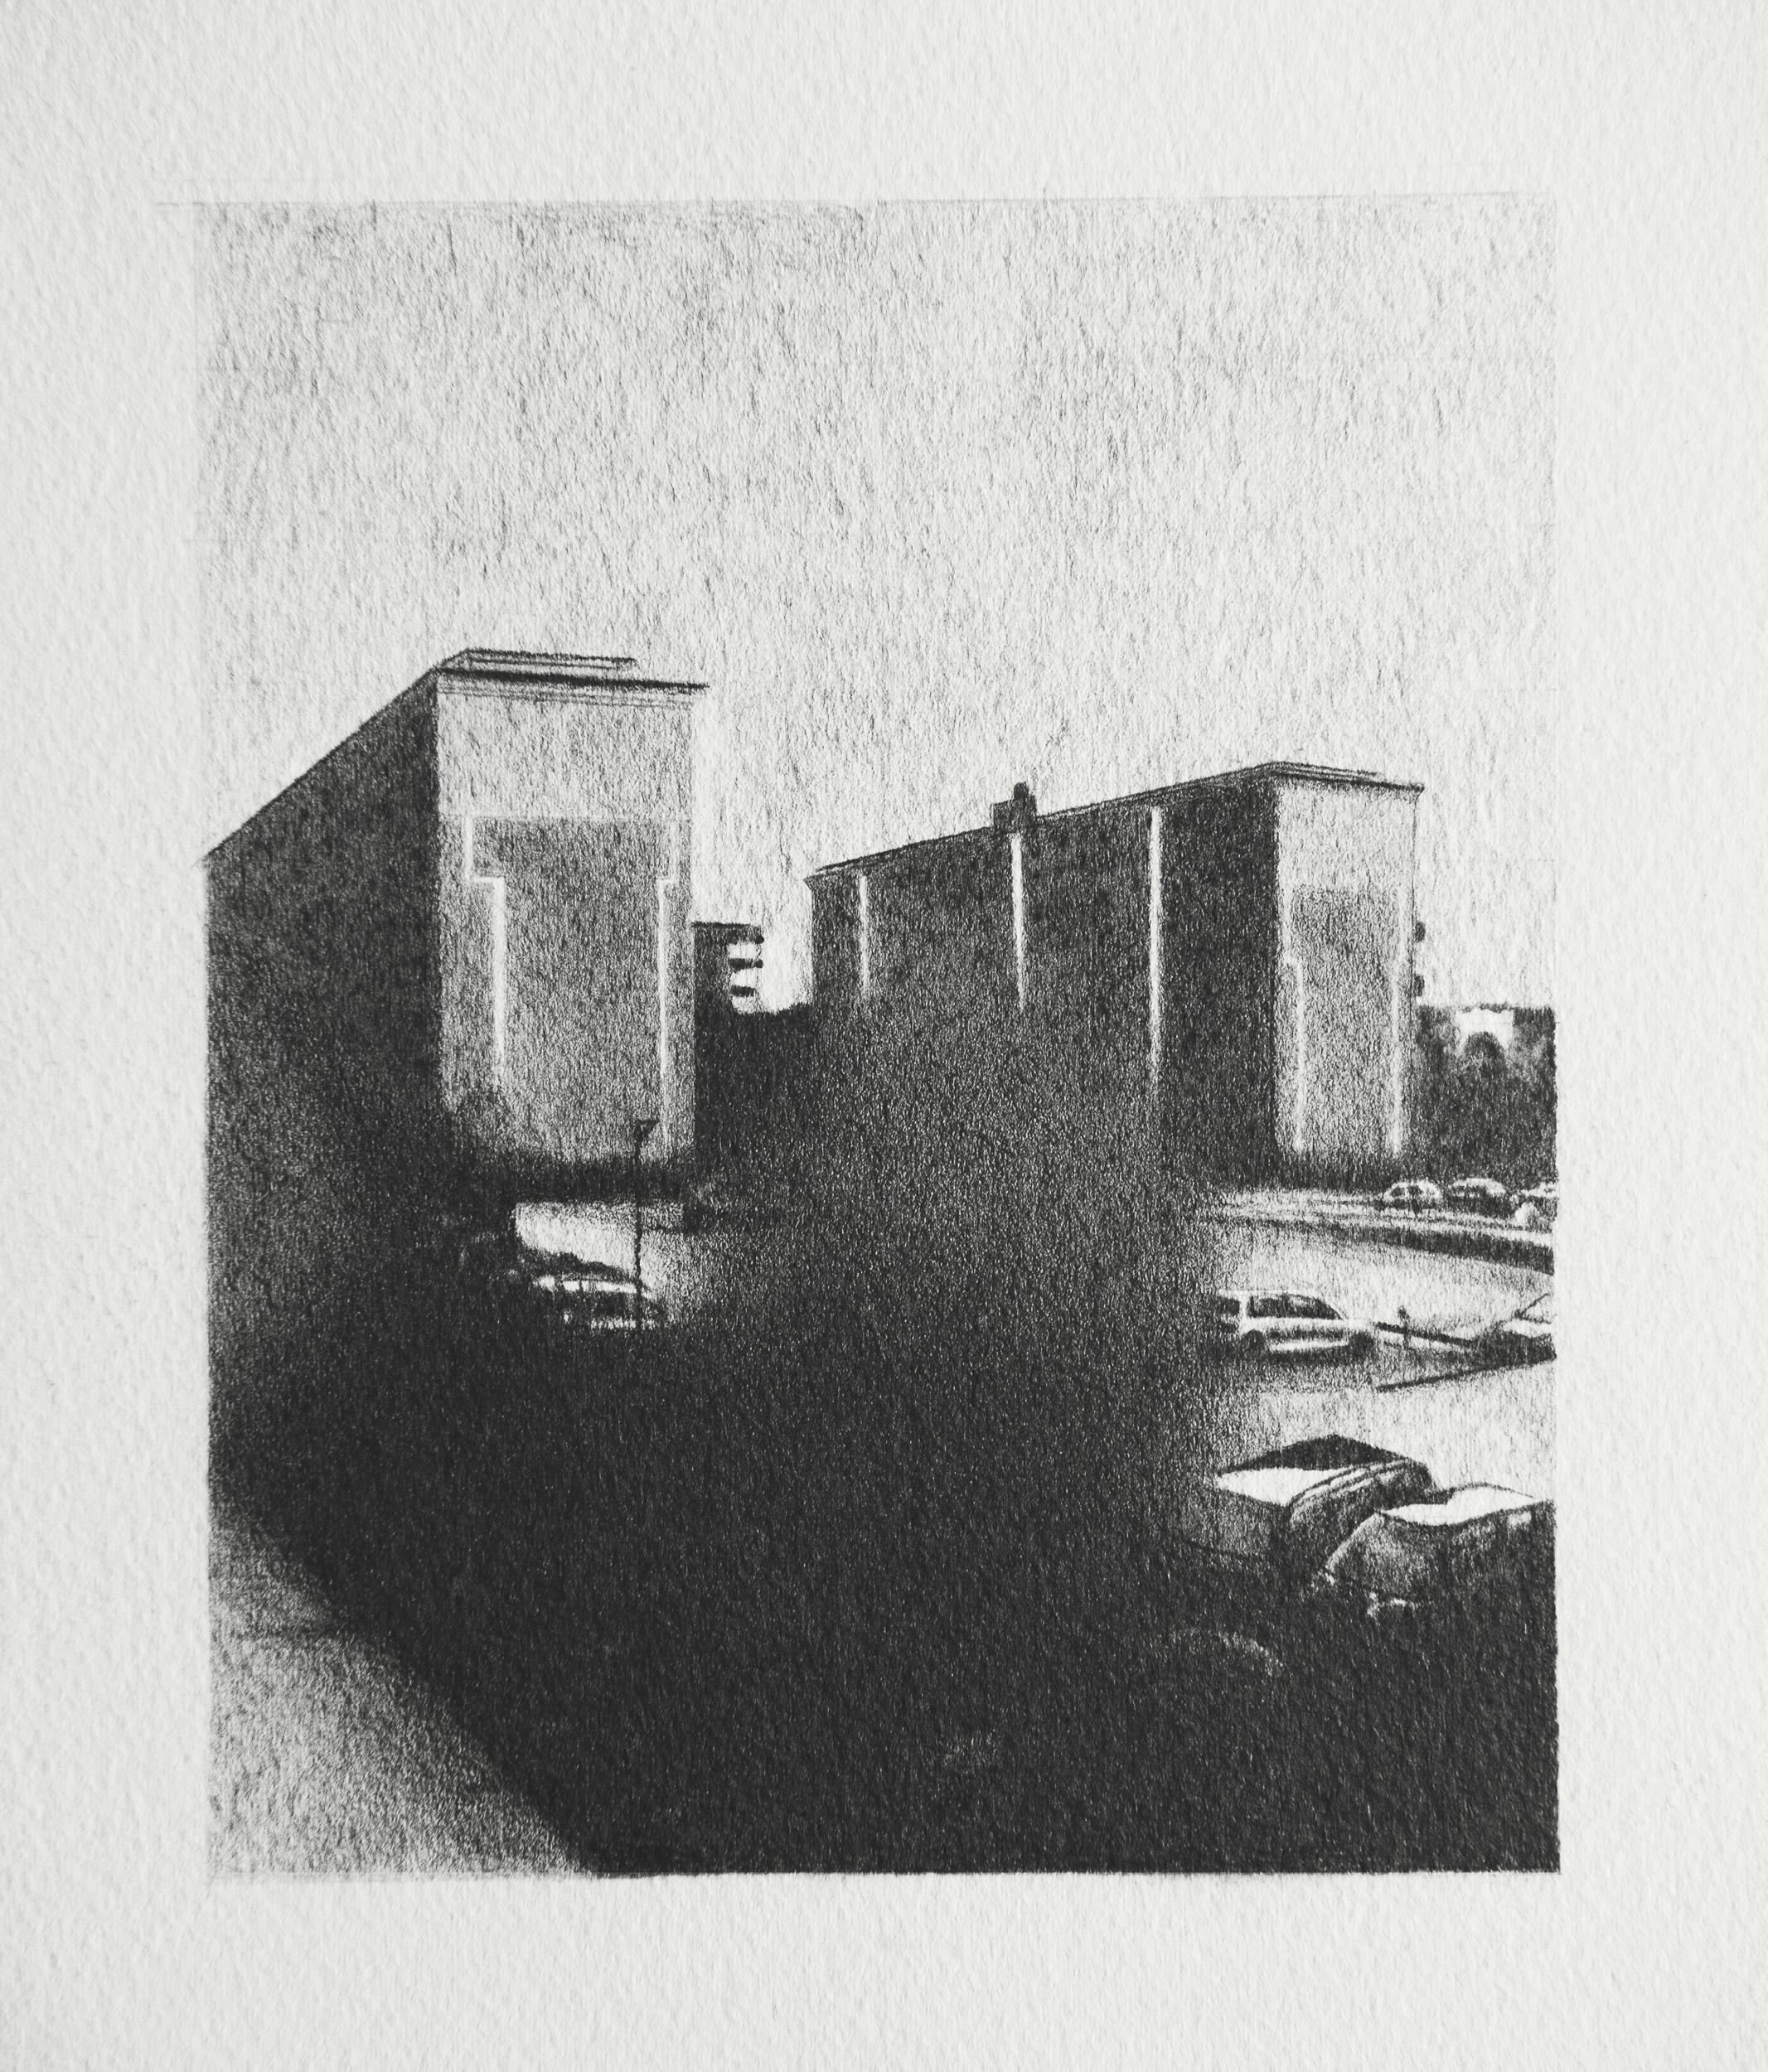 NORSBORG / 2015 20x15cm / Pencil on Paper